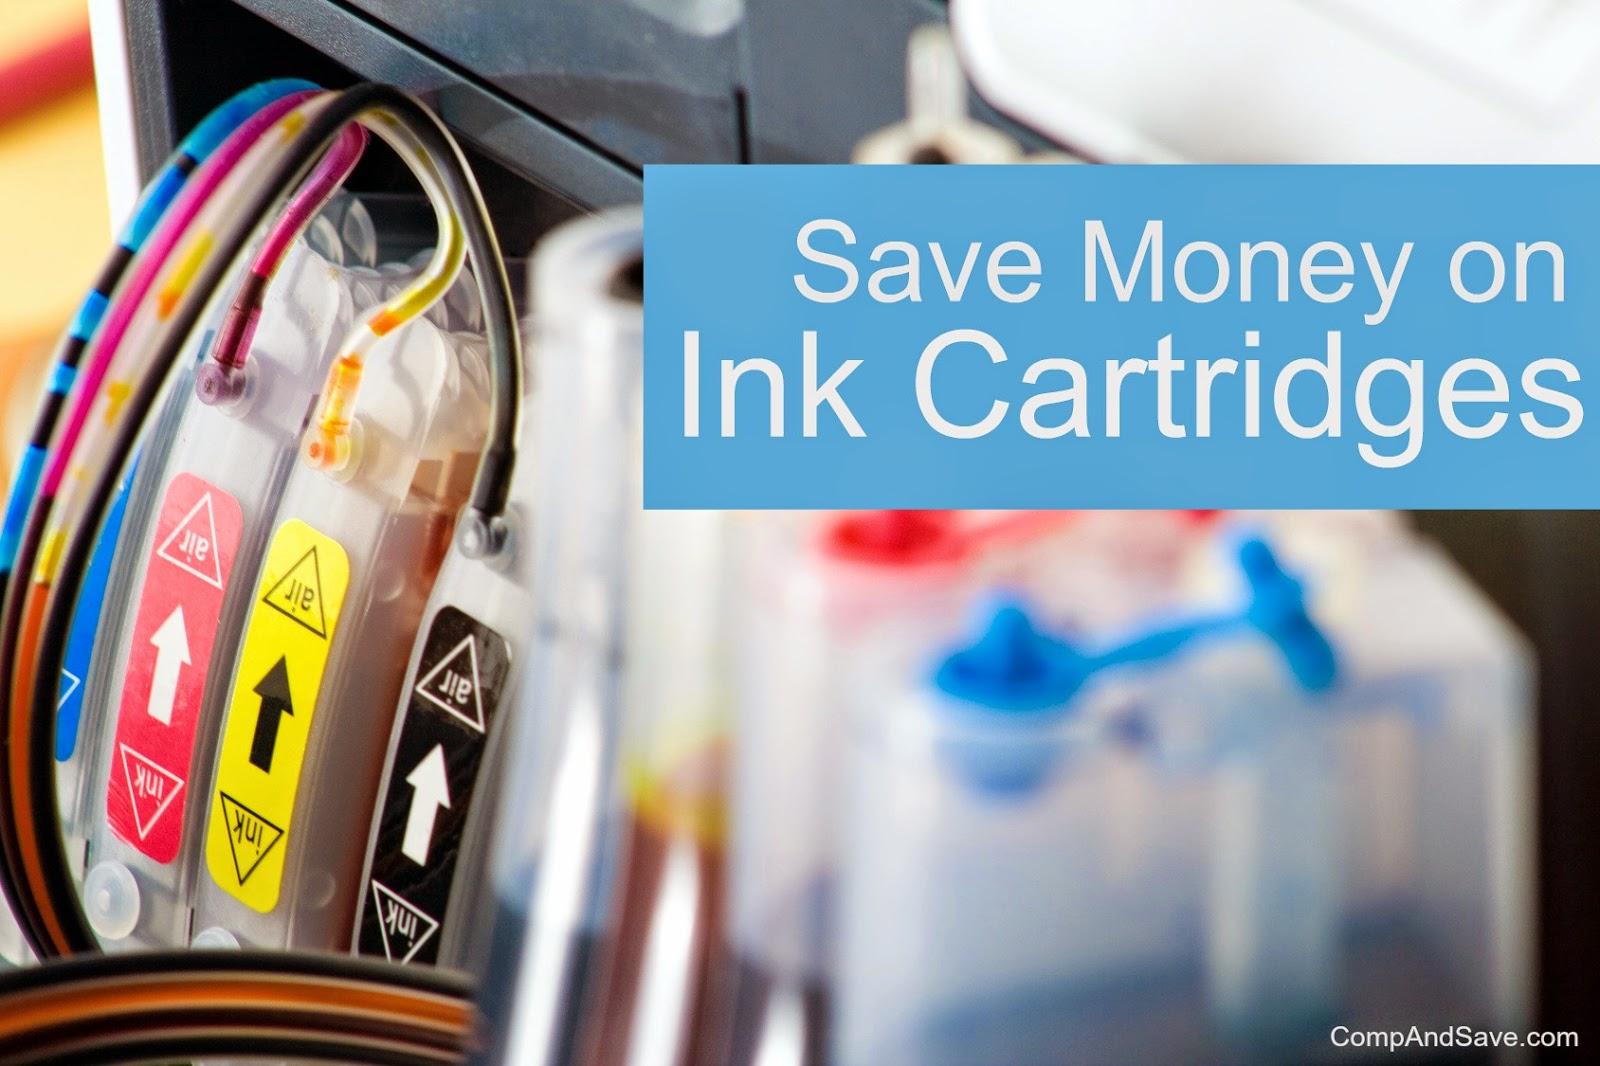 save money on ink cartridges